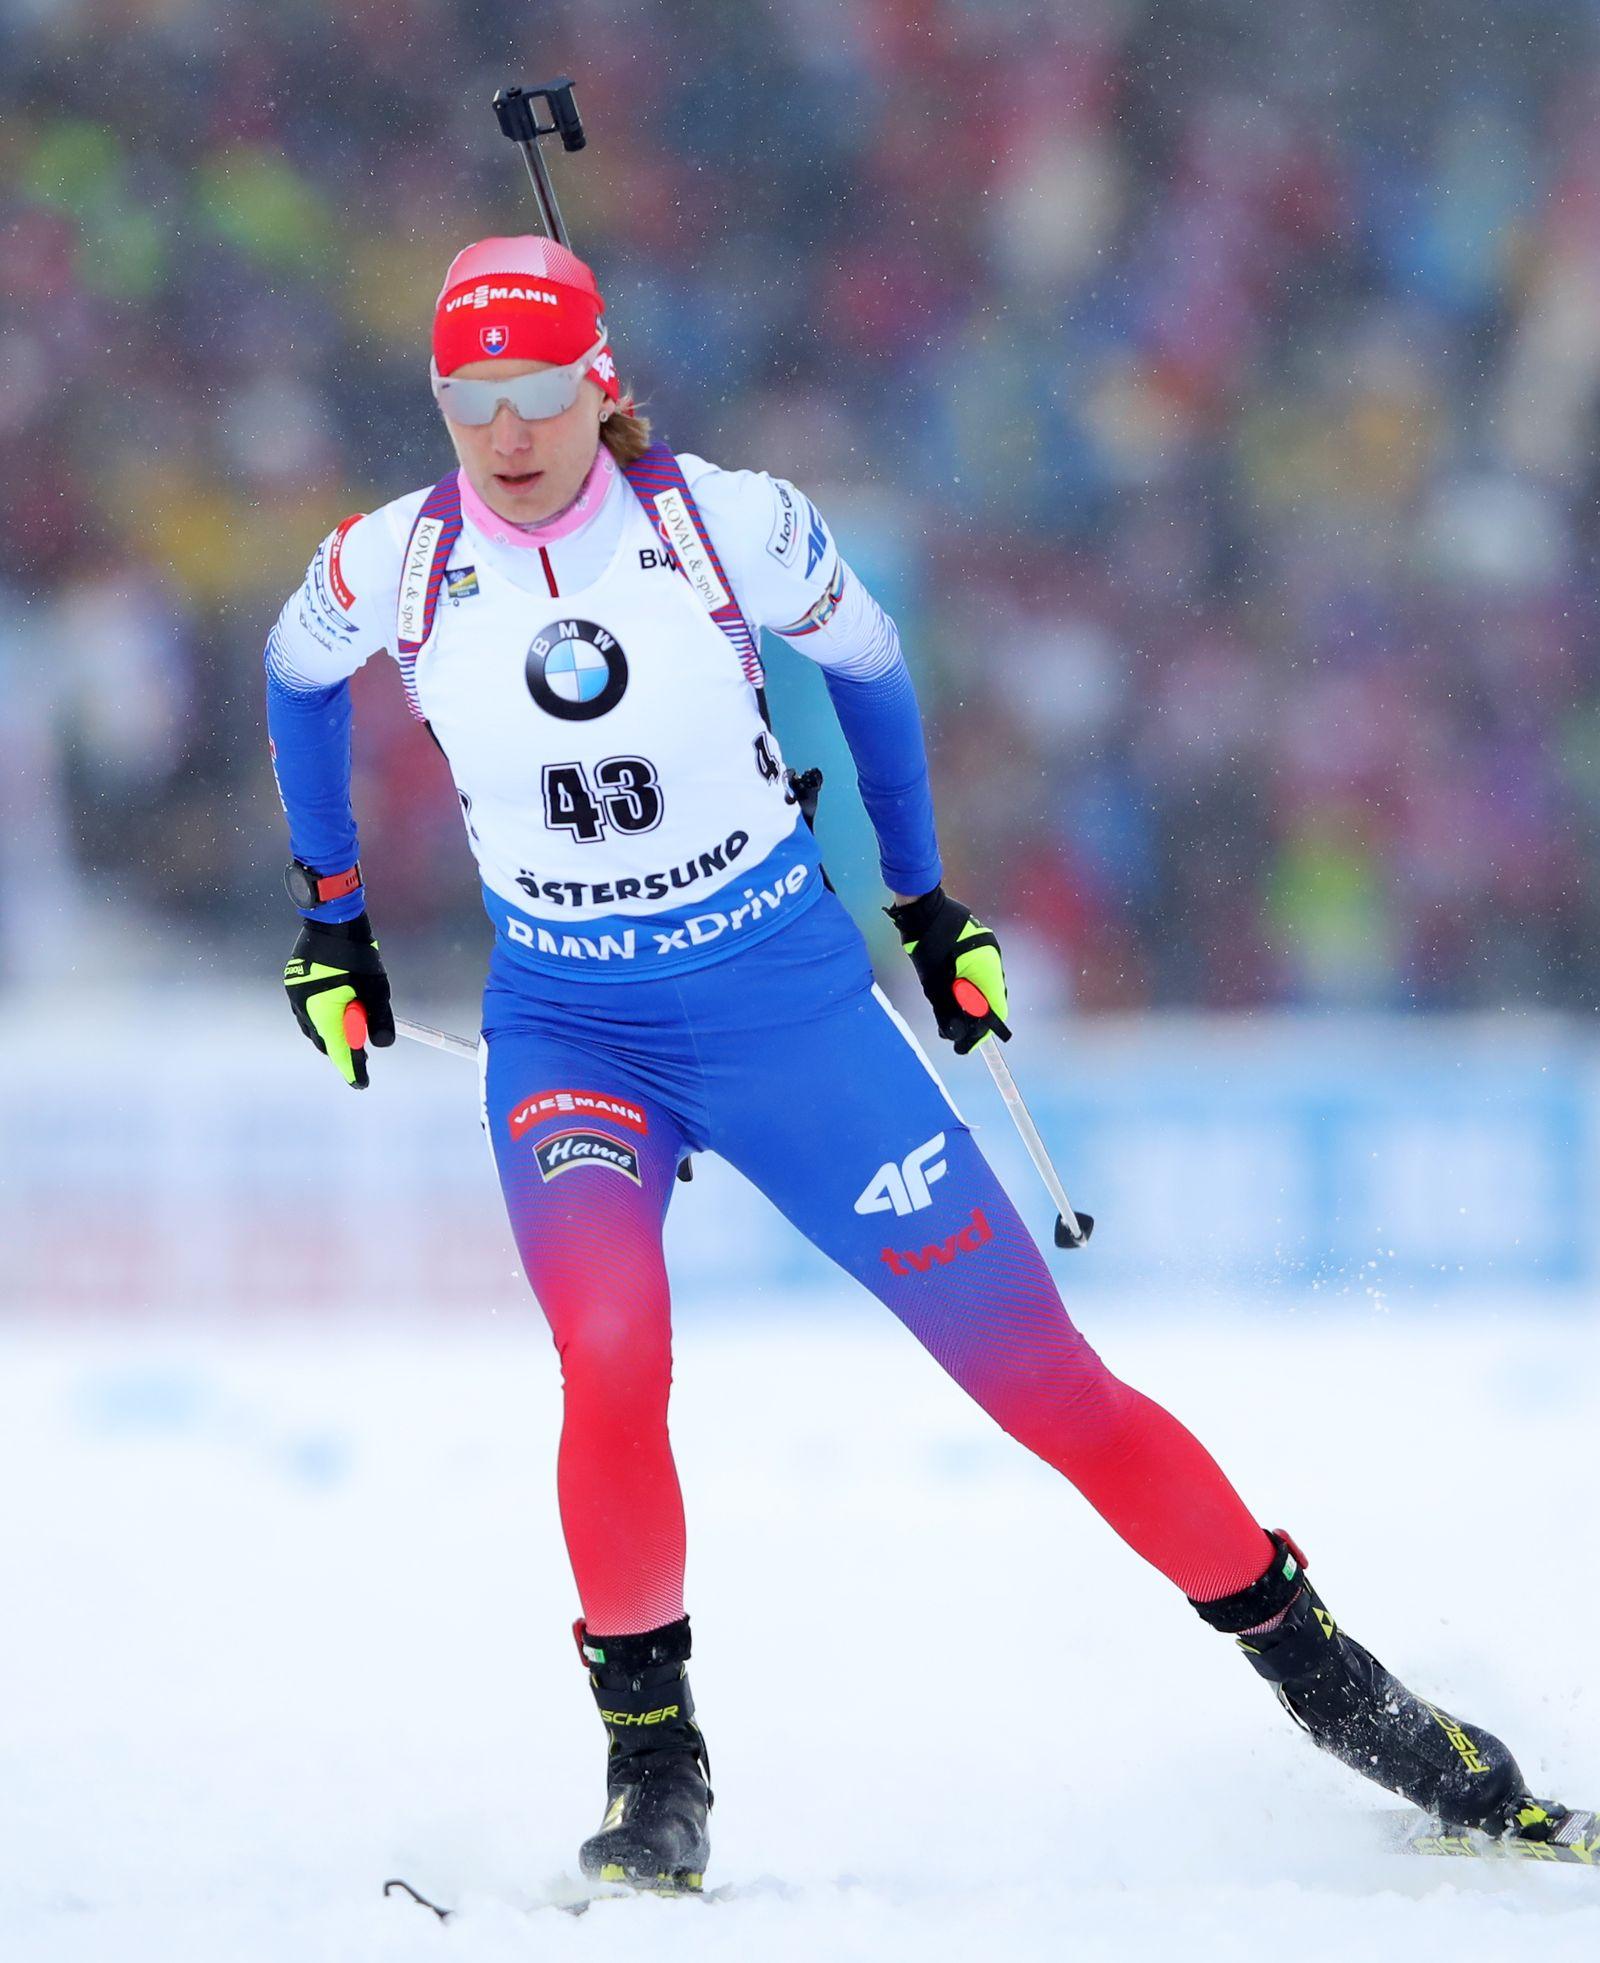 Kuzmina Biathlon